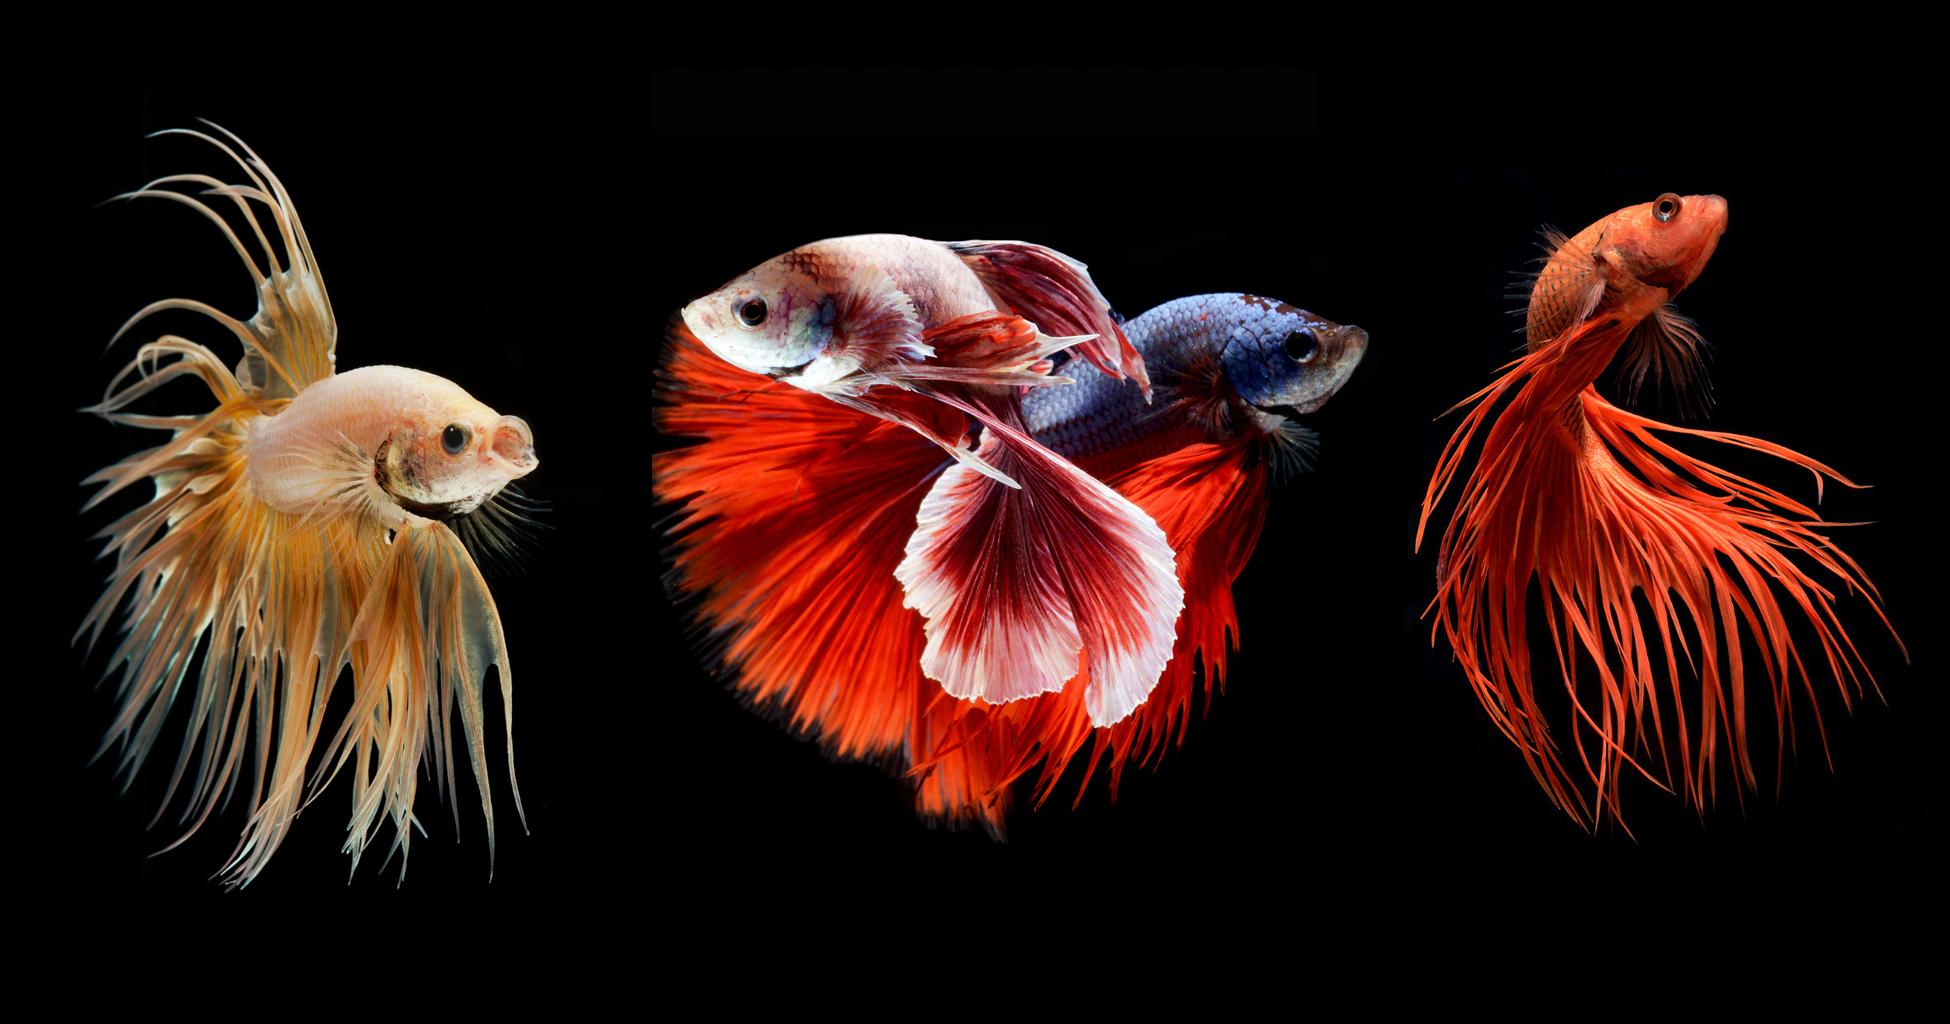 Hypnotizing Portraits Of Siamese Fighting Fish By Visarute Angkatavanich